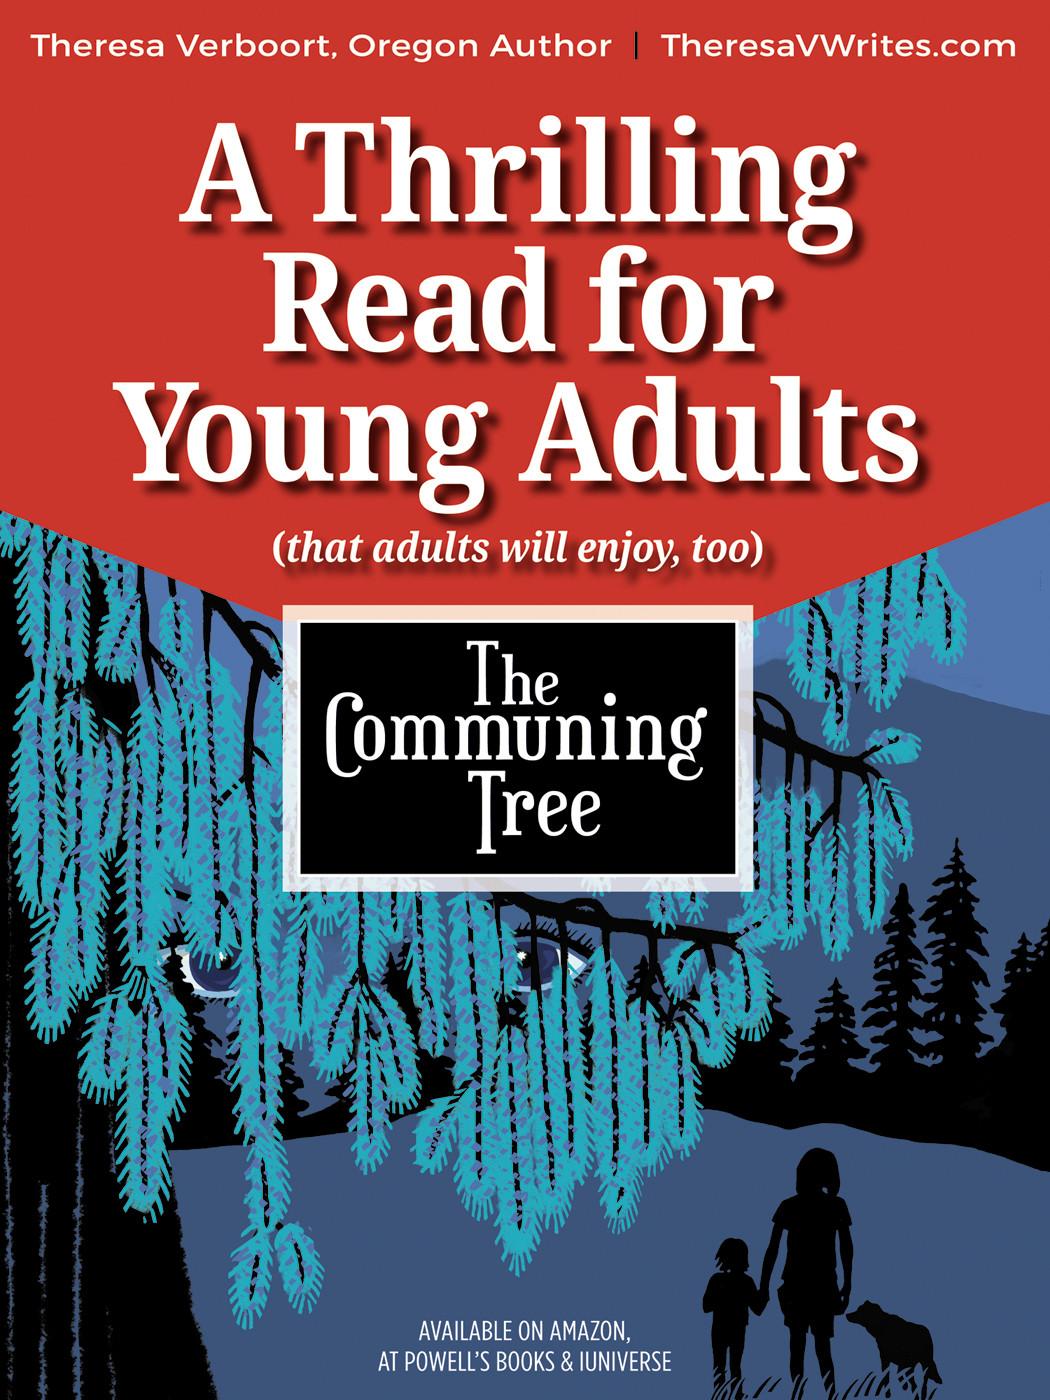 TheCommuningTree_Poster_3_RGB.jpg